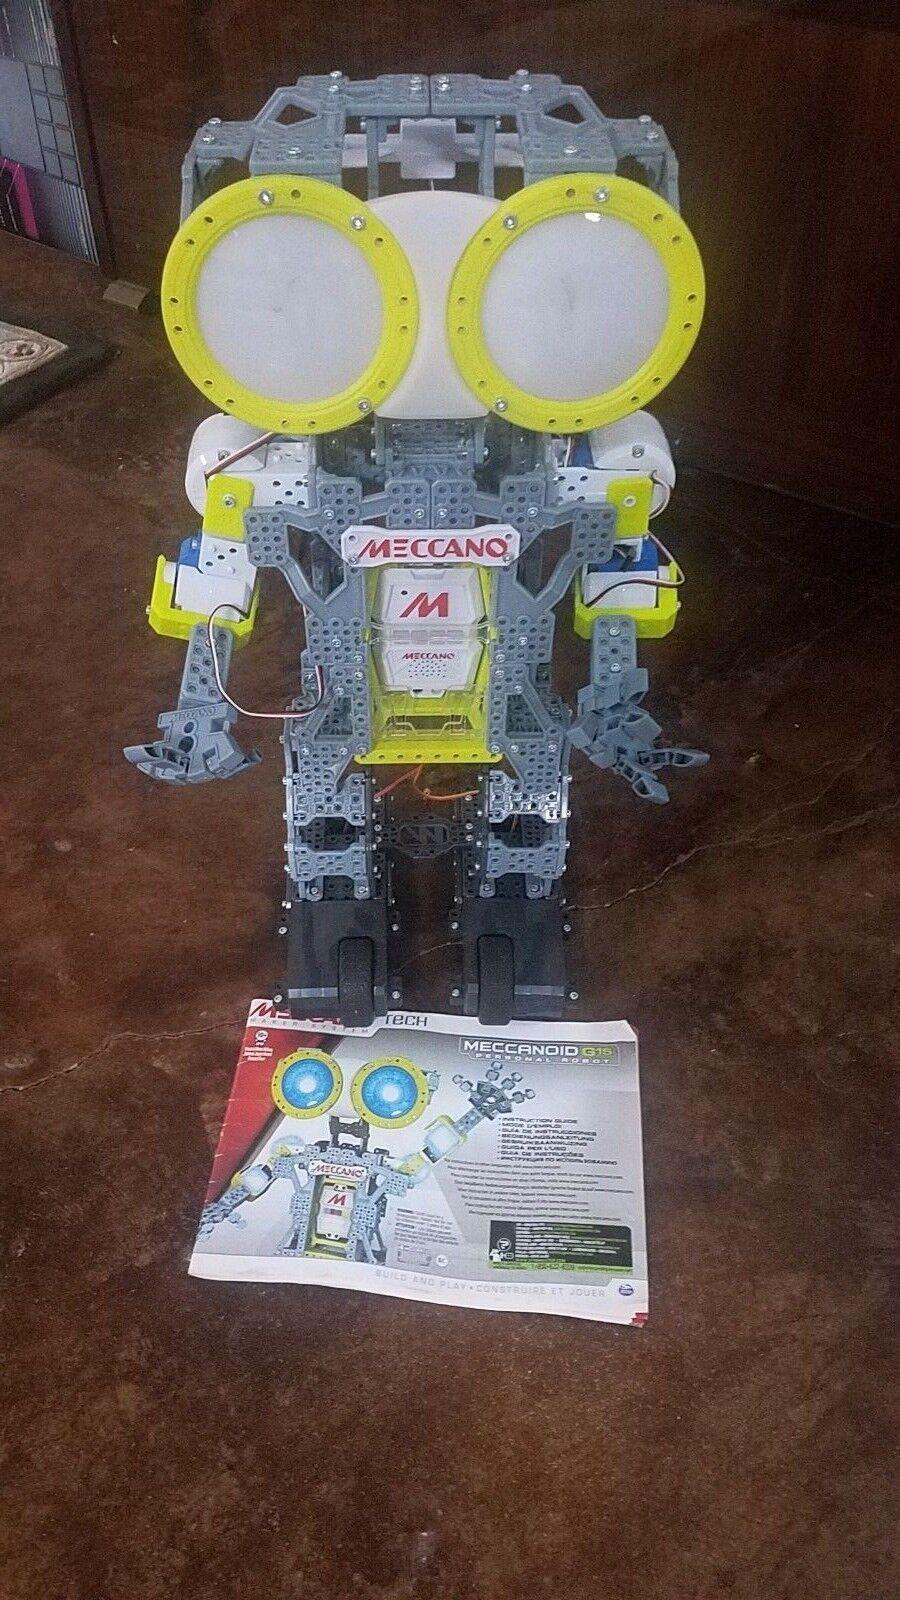 Meccano Tech Maker System Meccanoid G15 Personal Robot Large Building Set